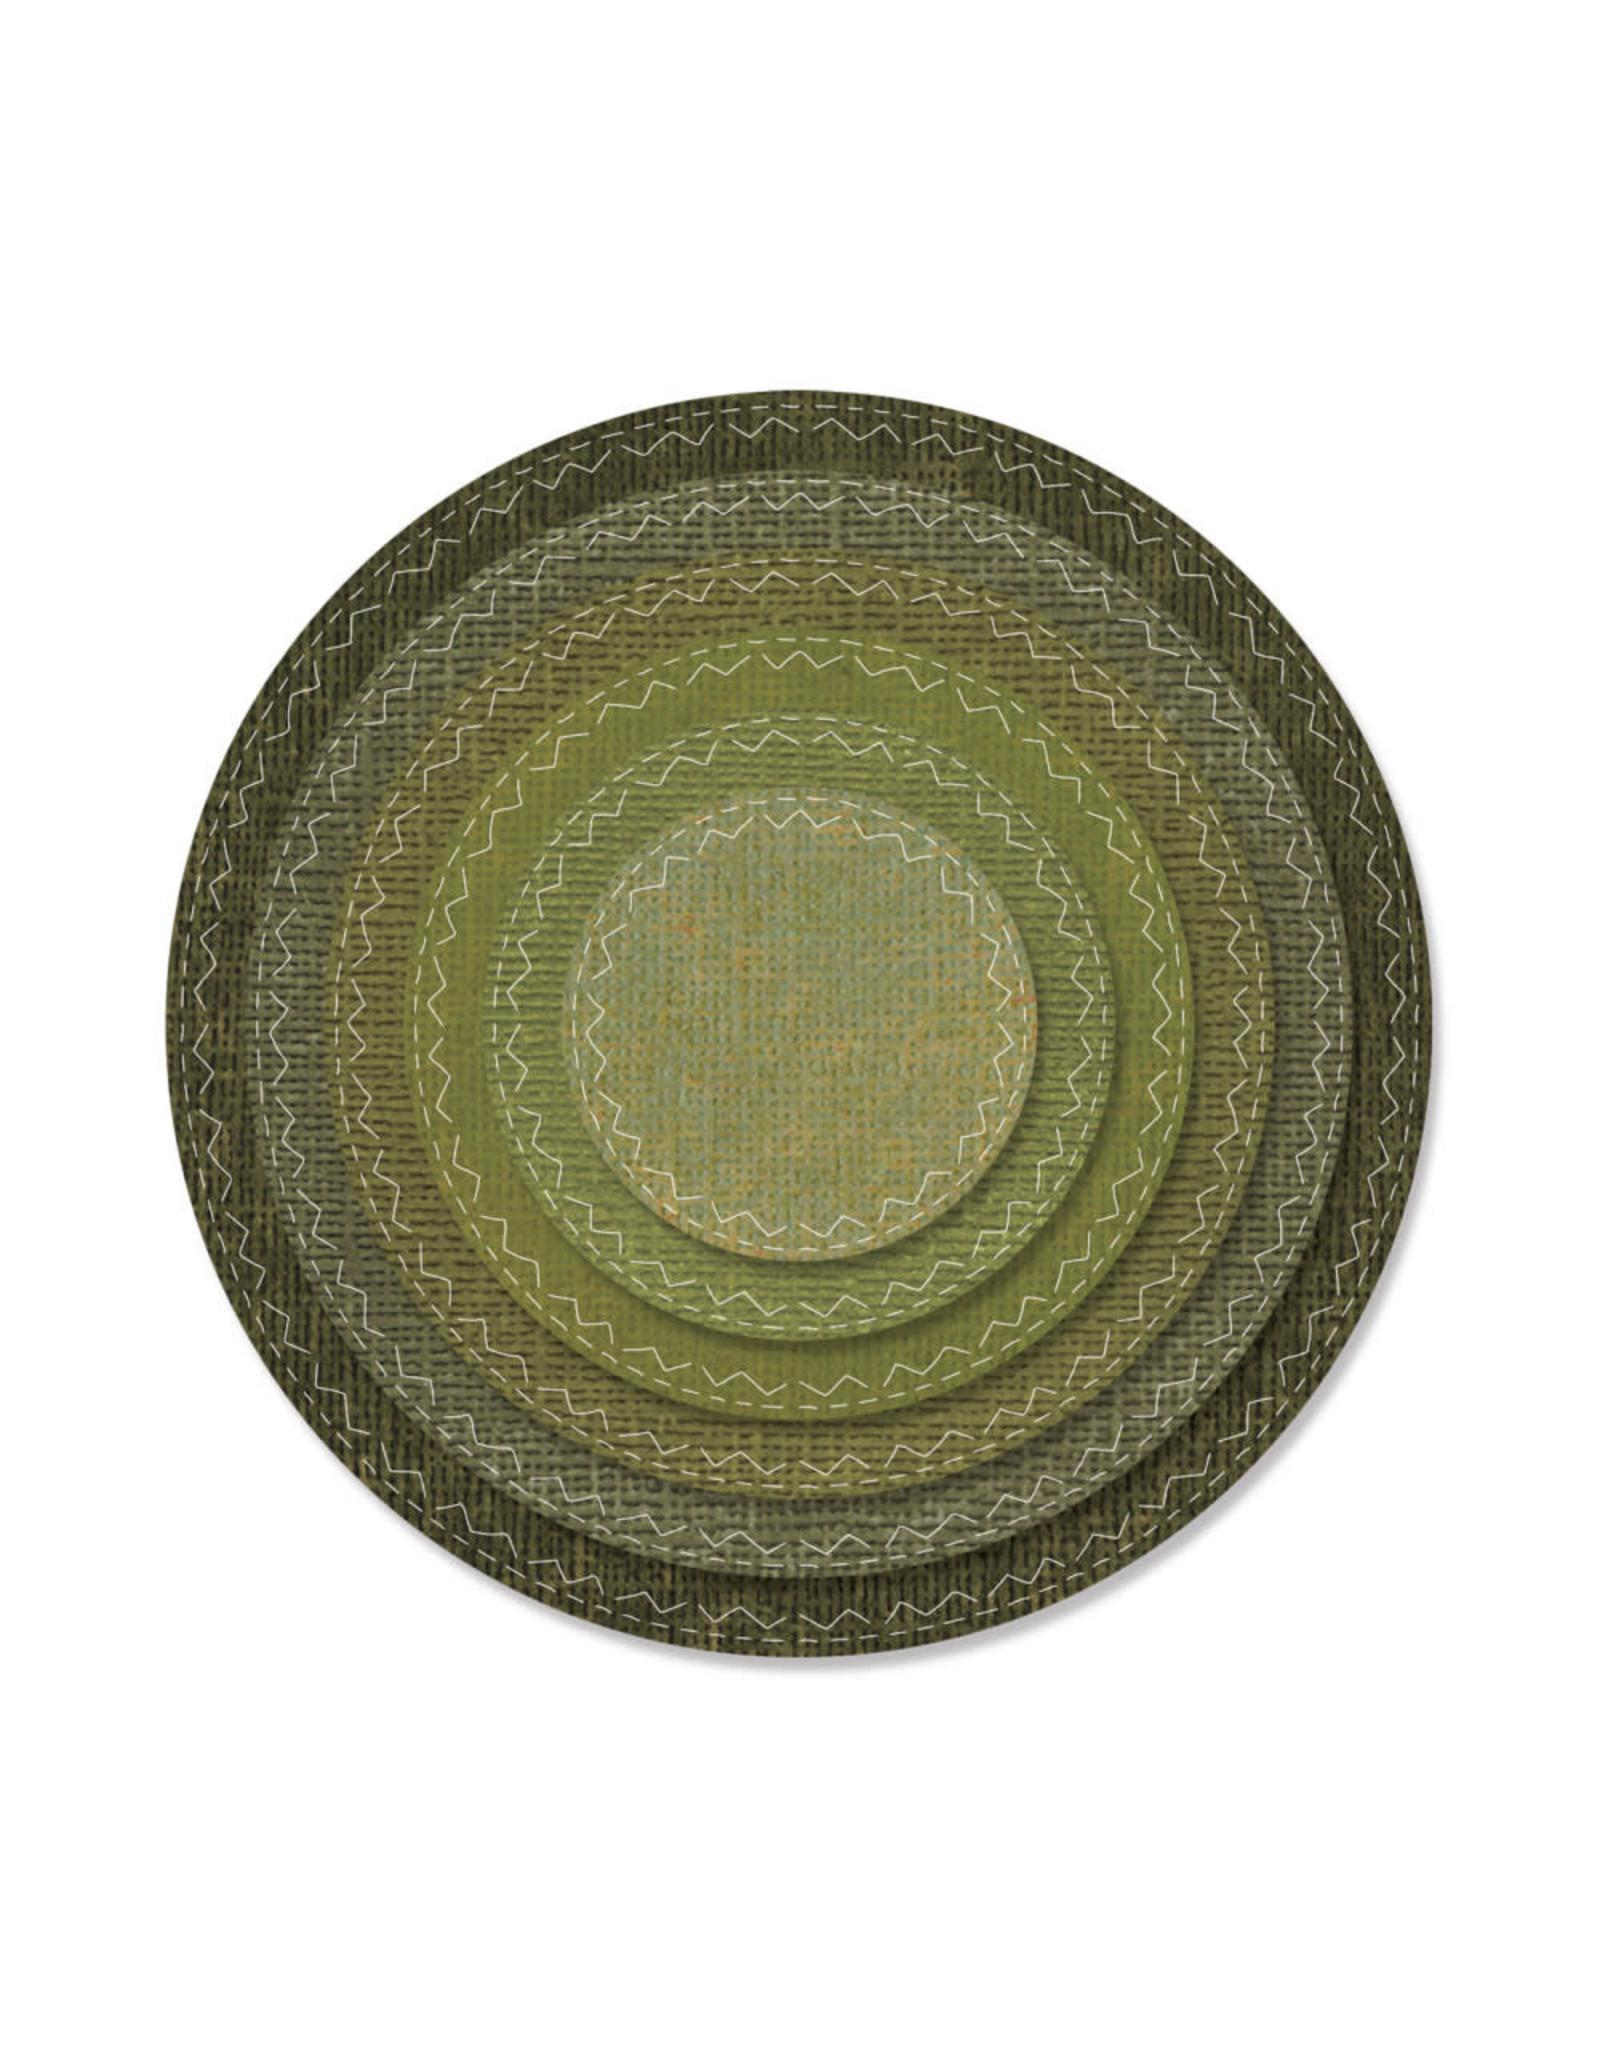 Ellison/Sizzix Stitched Circles - Framelits (RETIRED) (25%)